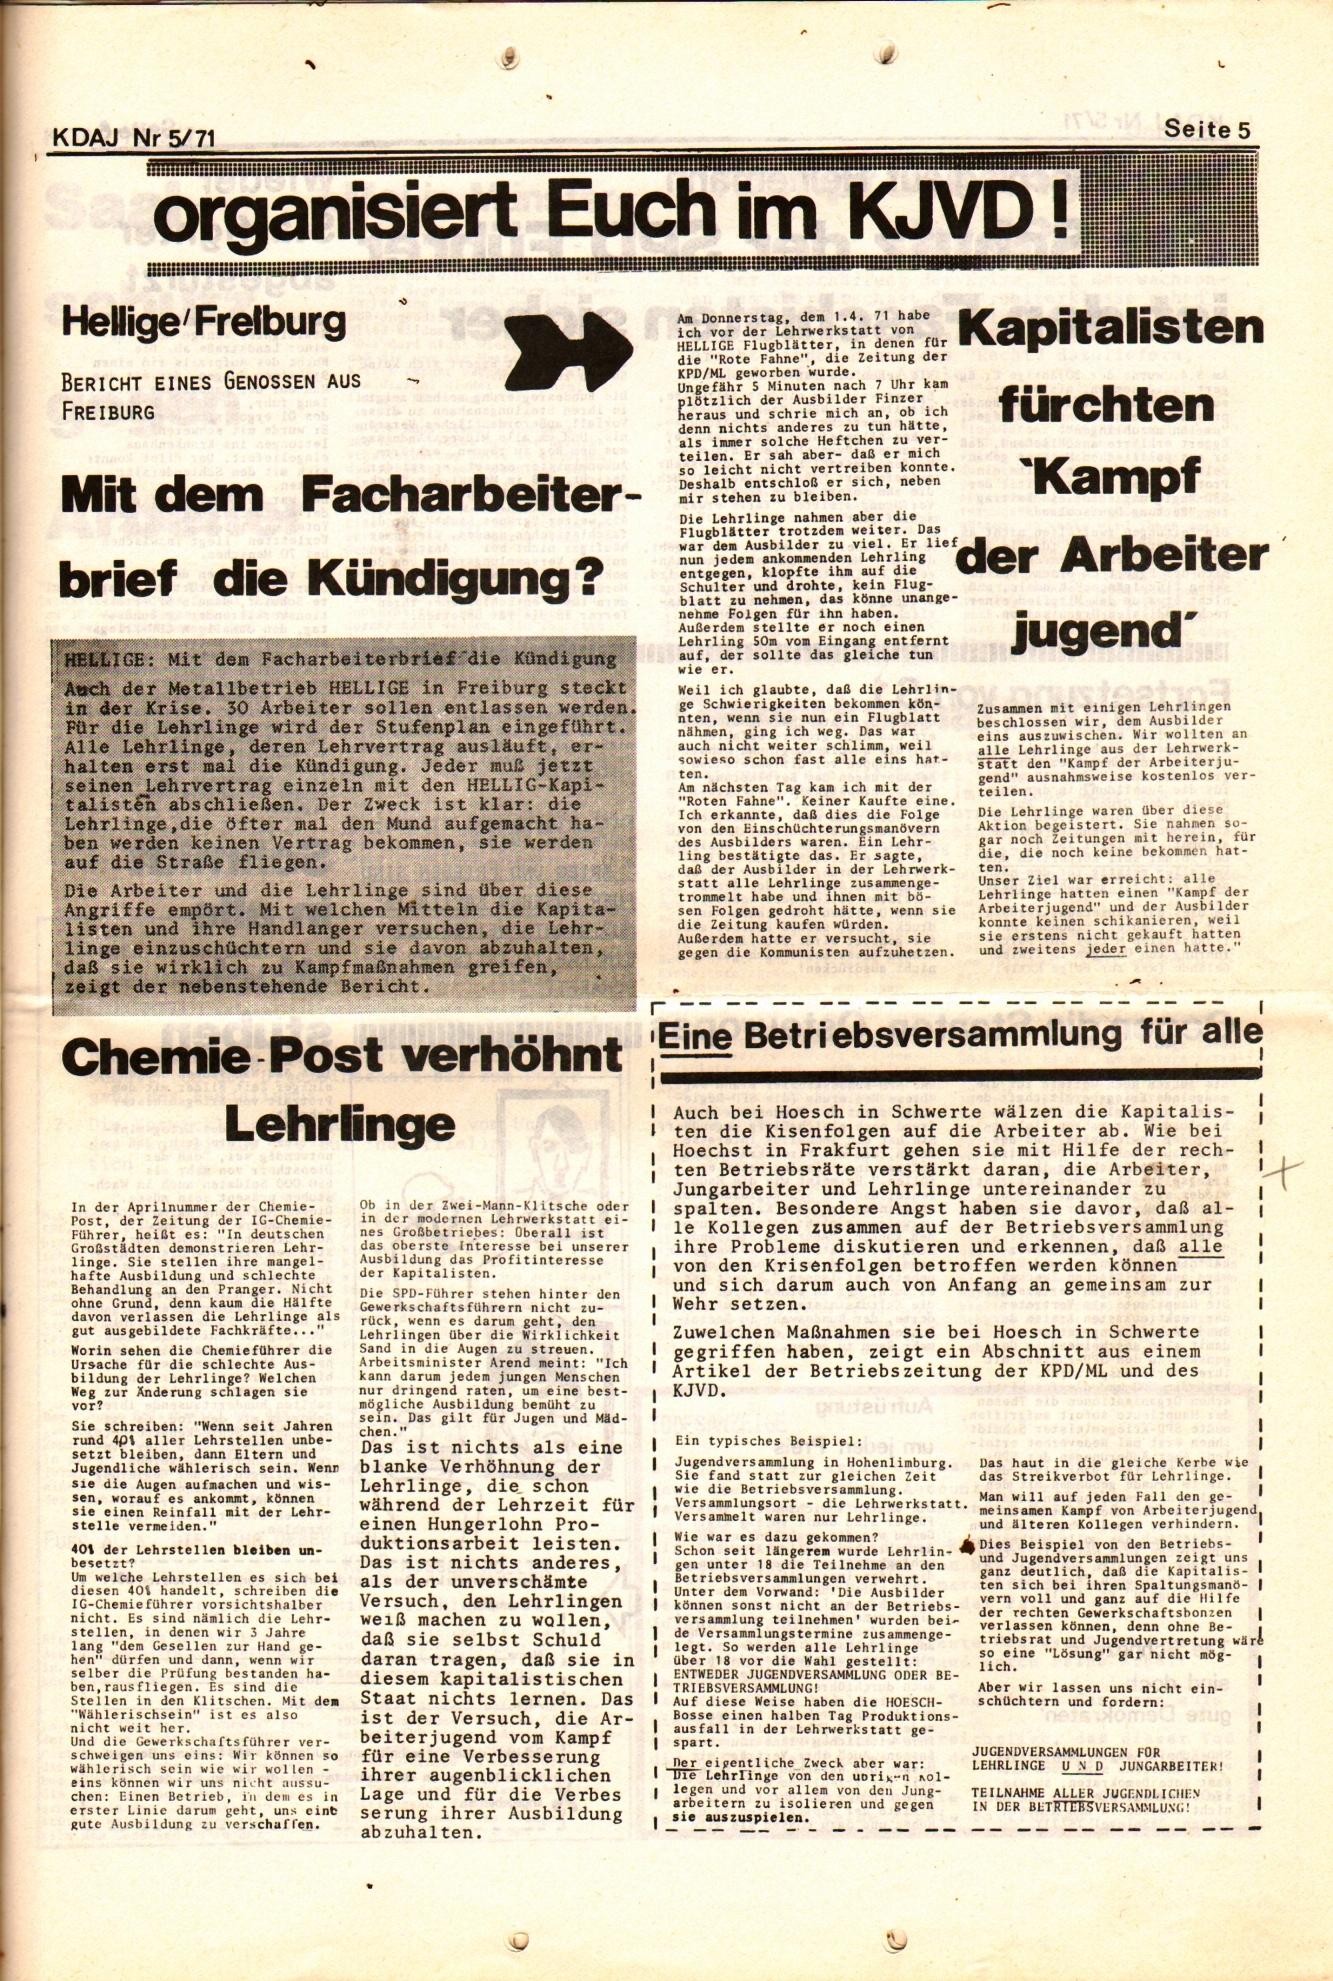 KDAJ, 2. Jg., Mai 1971, Nr. 5, Seite 5